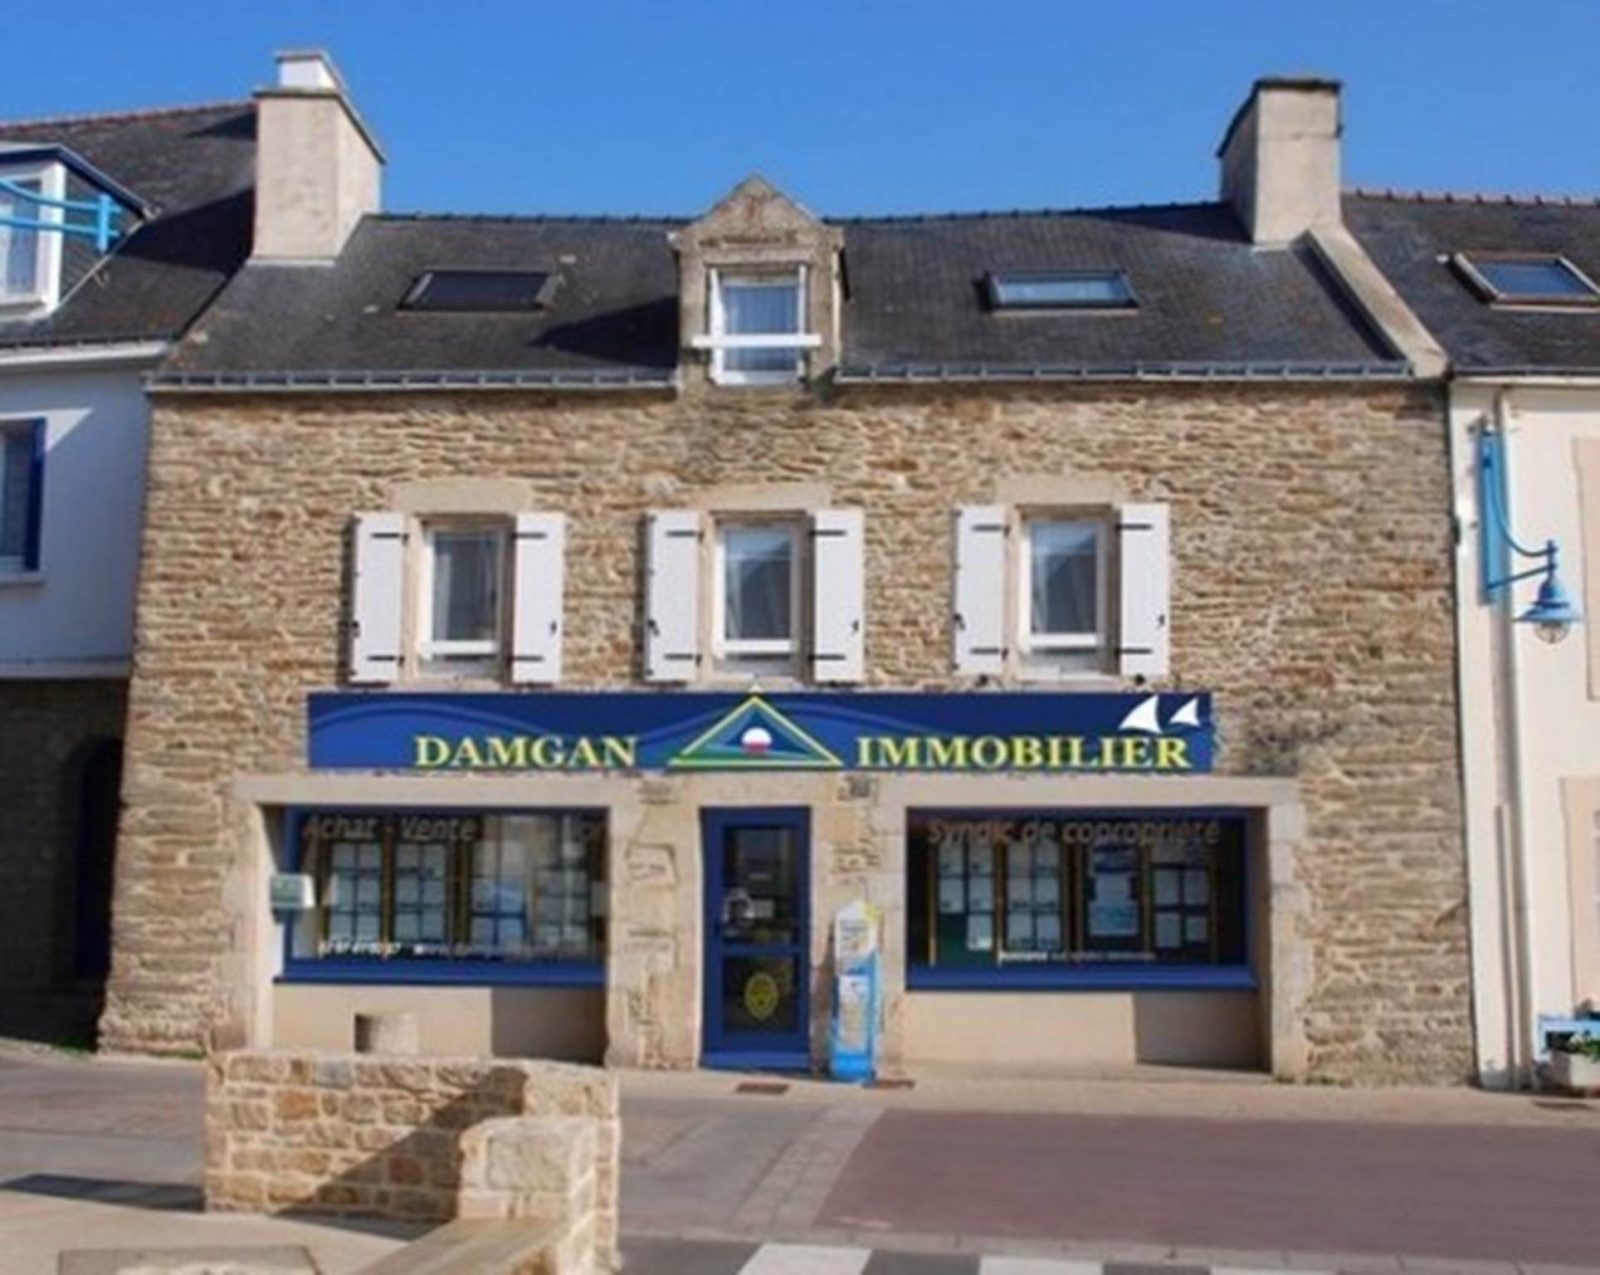 Damgan immobilier Damgan Morbihan